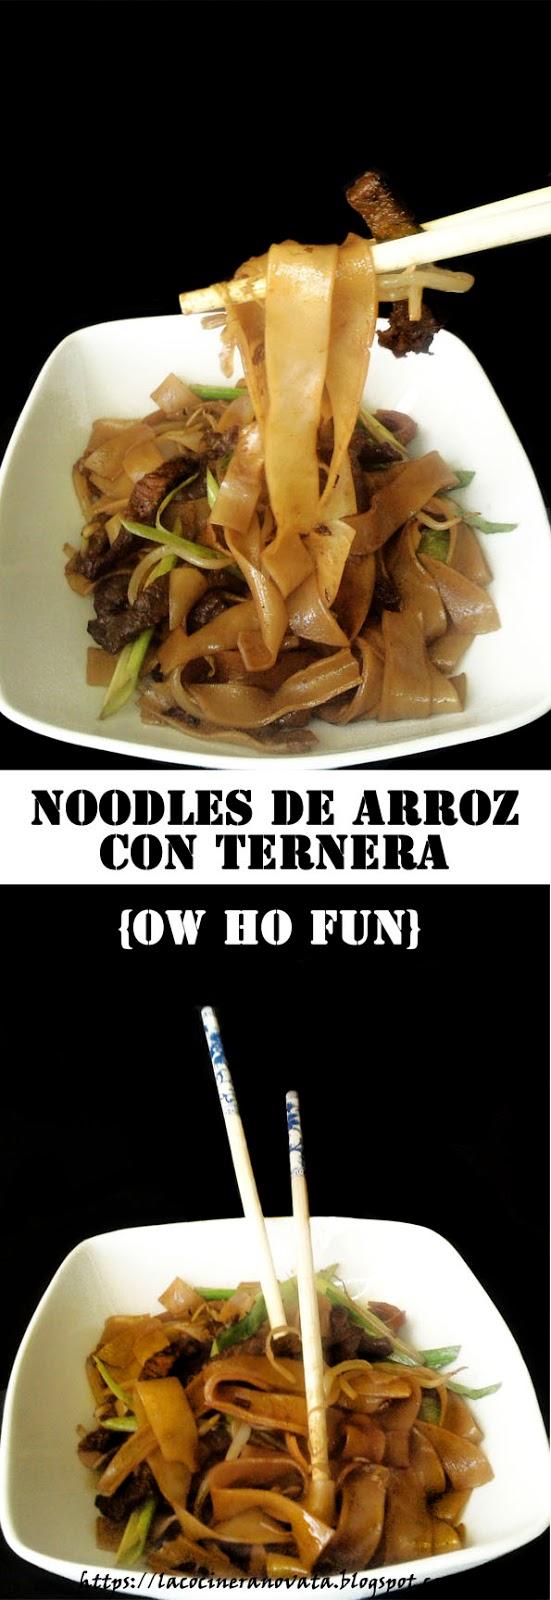 Noodles de arroz con ternera La Cocinera Novata receta plato gastronomia China pasta carne rapida fideos comer con palillos